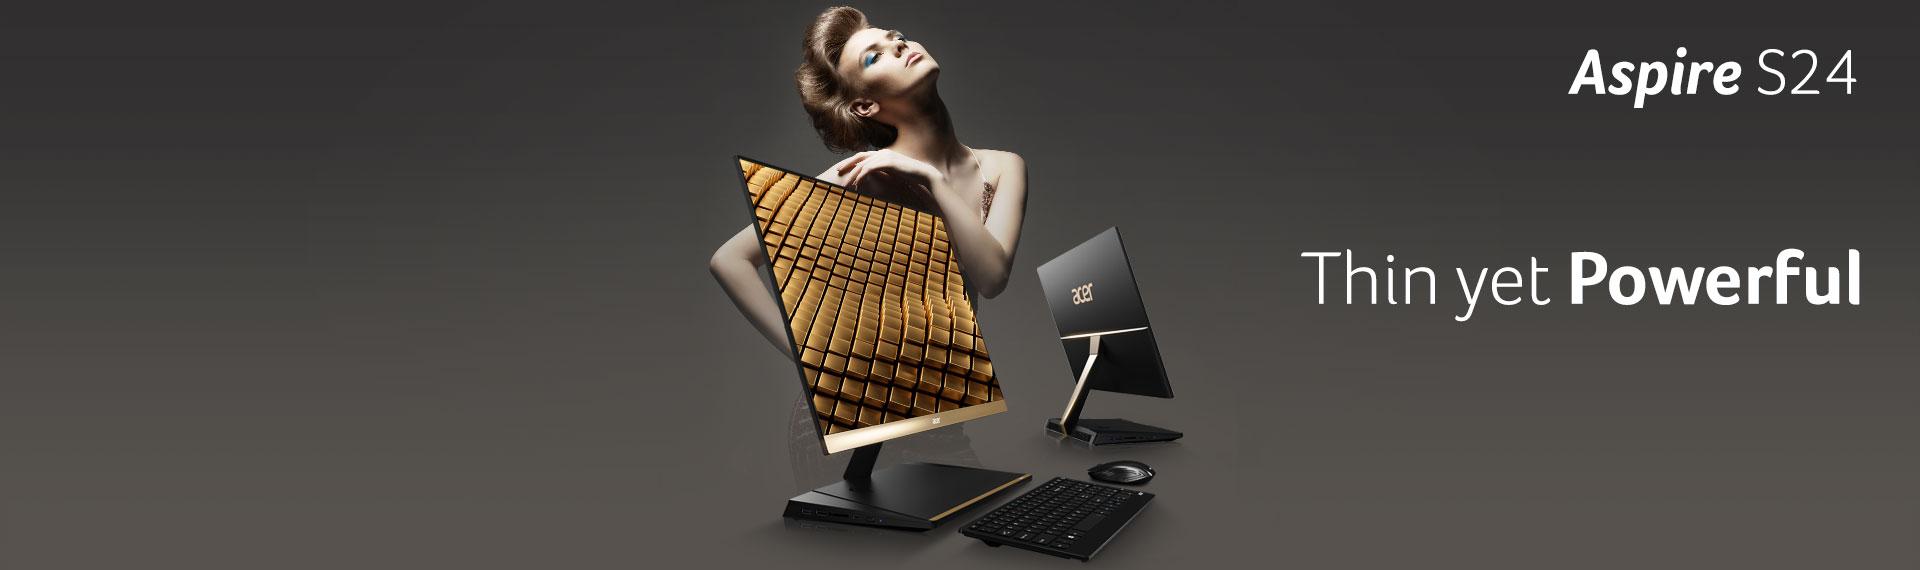 Acer Aspire S24, PC AIO Fleksibel dalam Desain Super Tipis